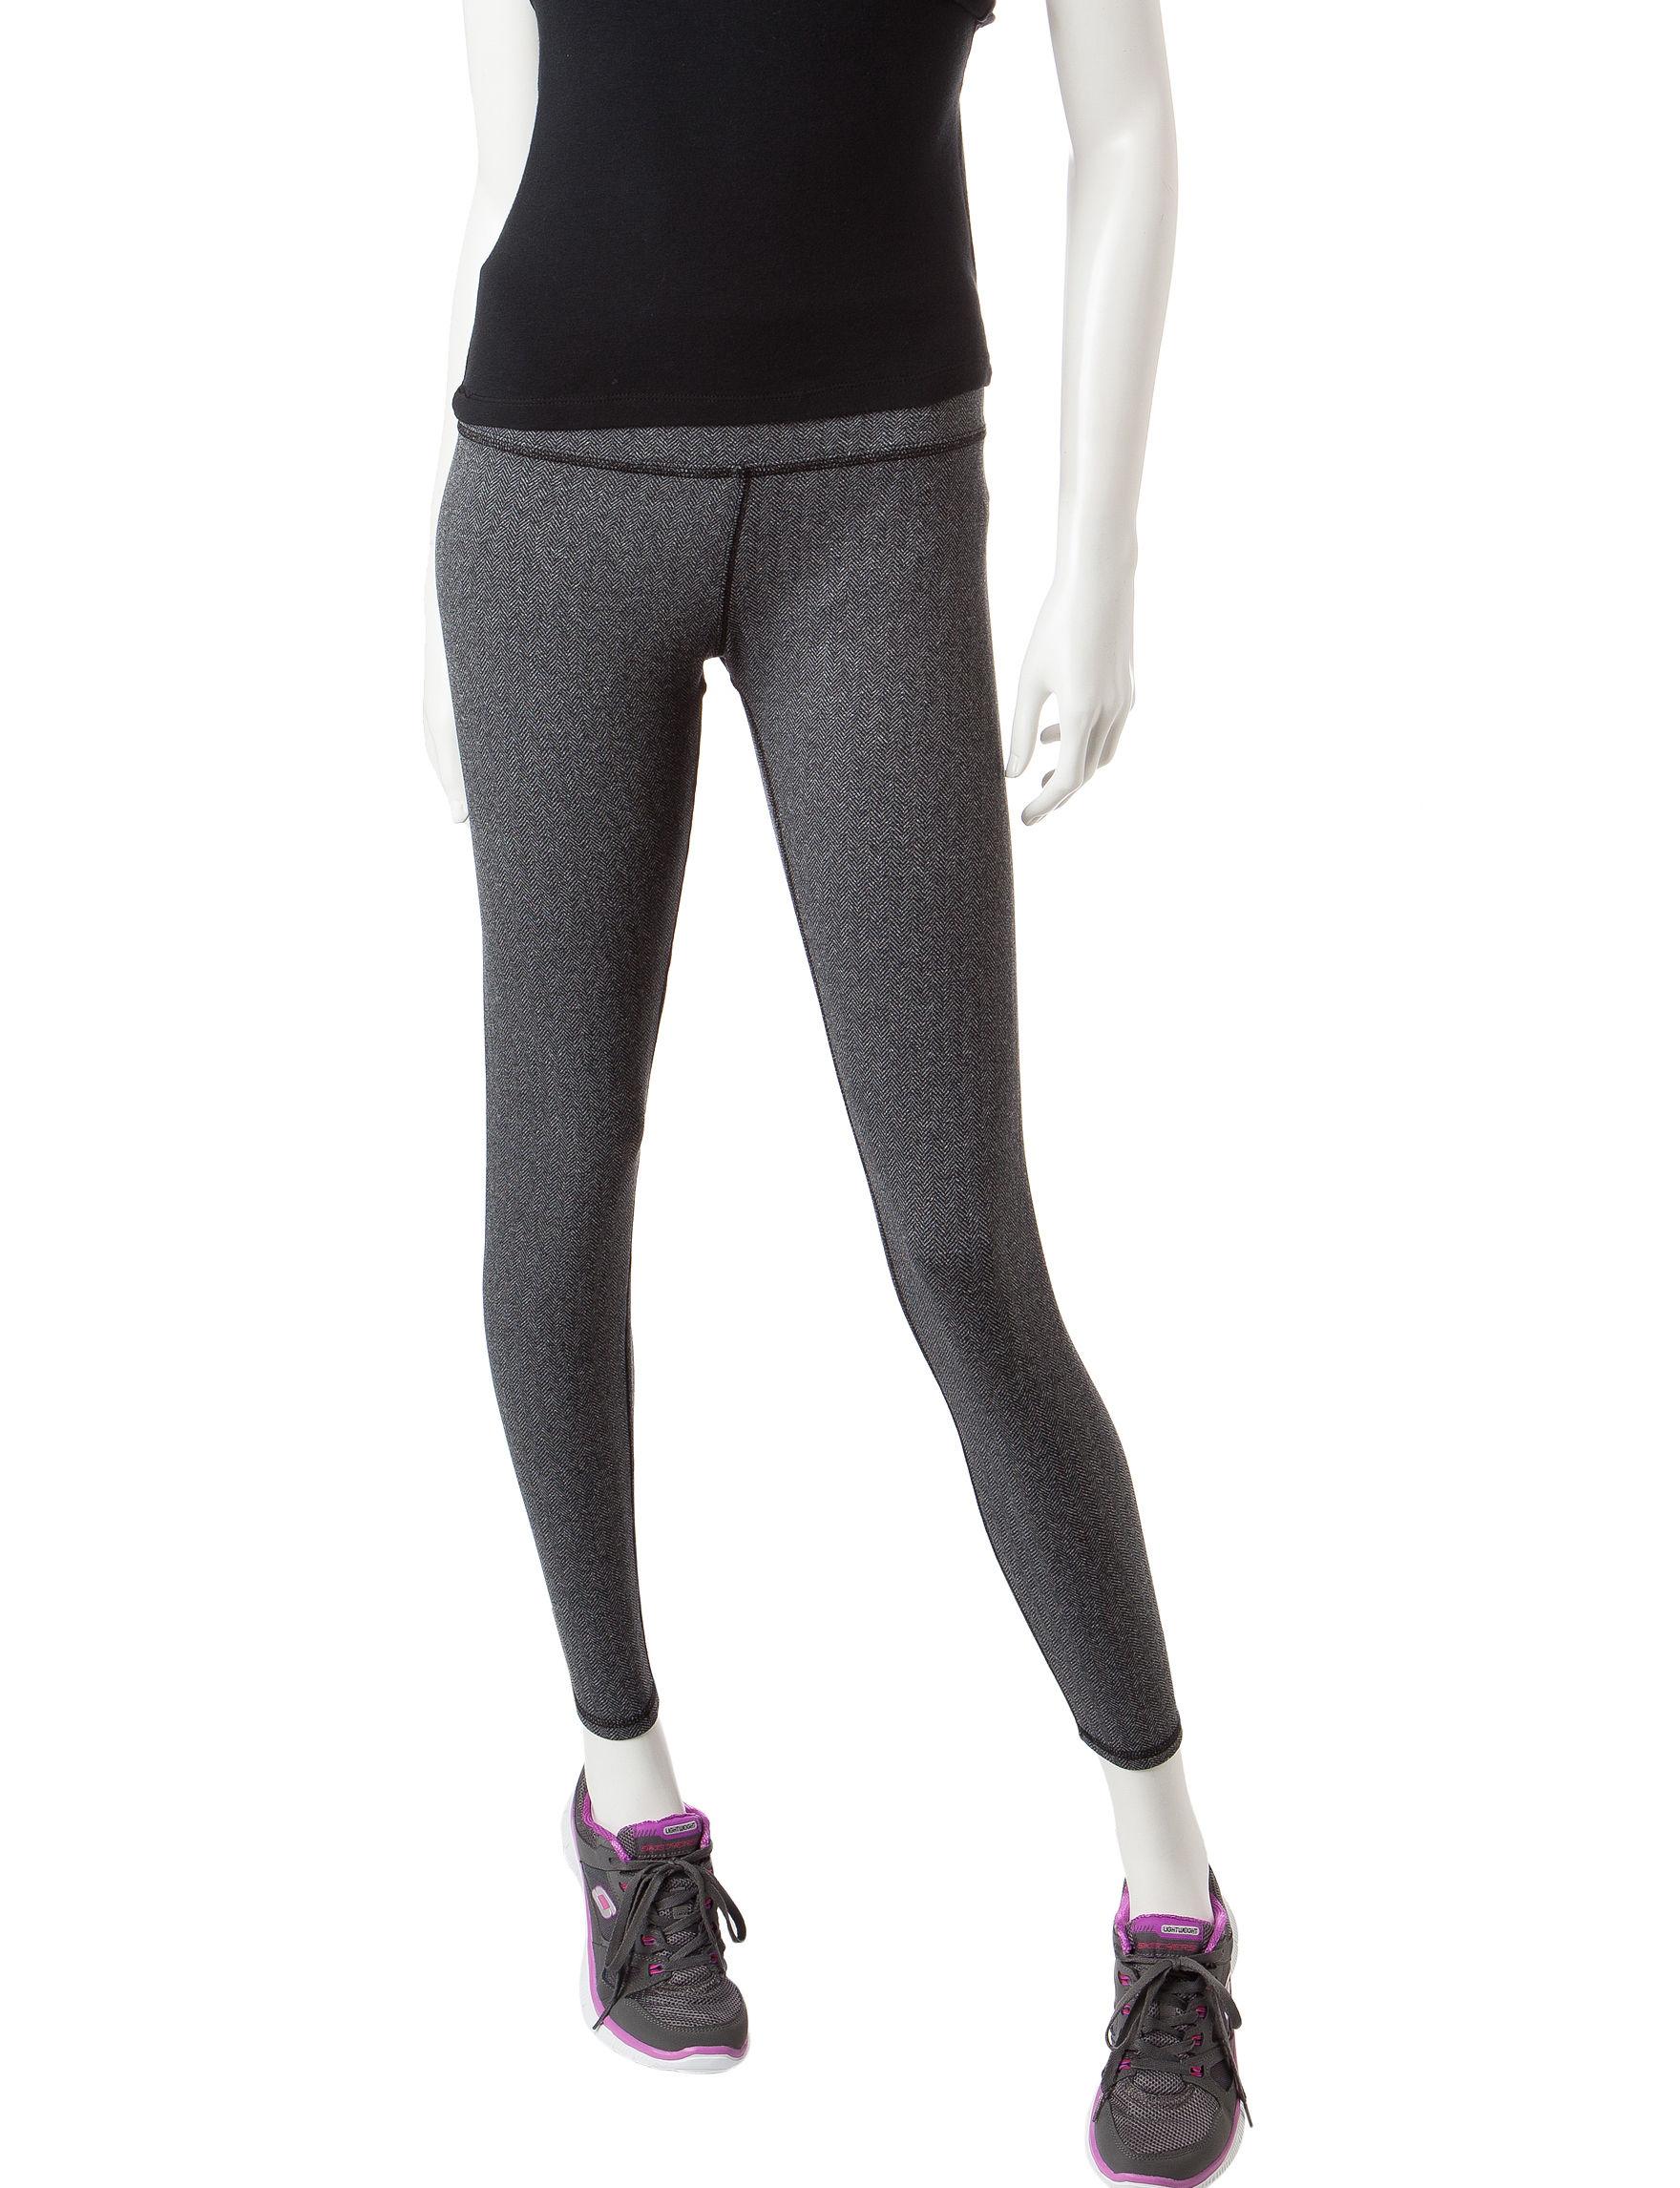 RBX Black / Grey Leggings